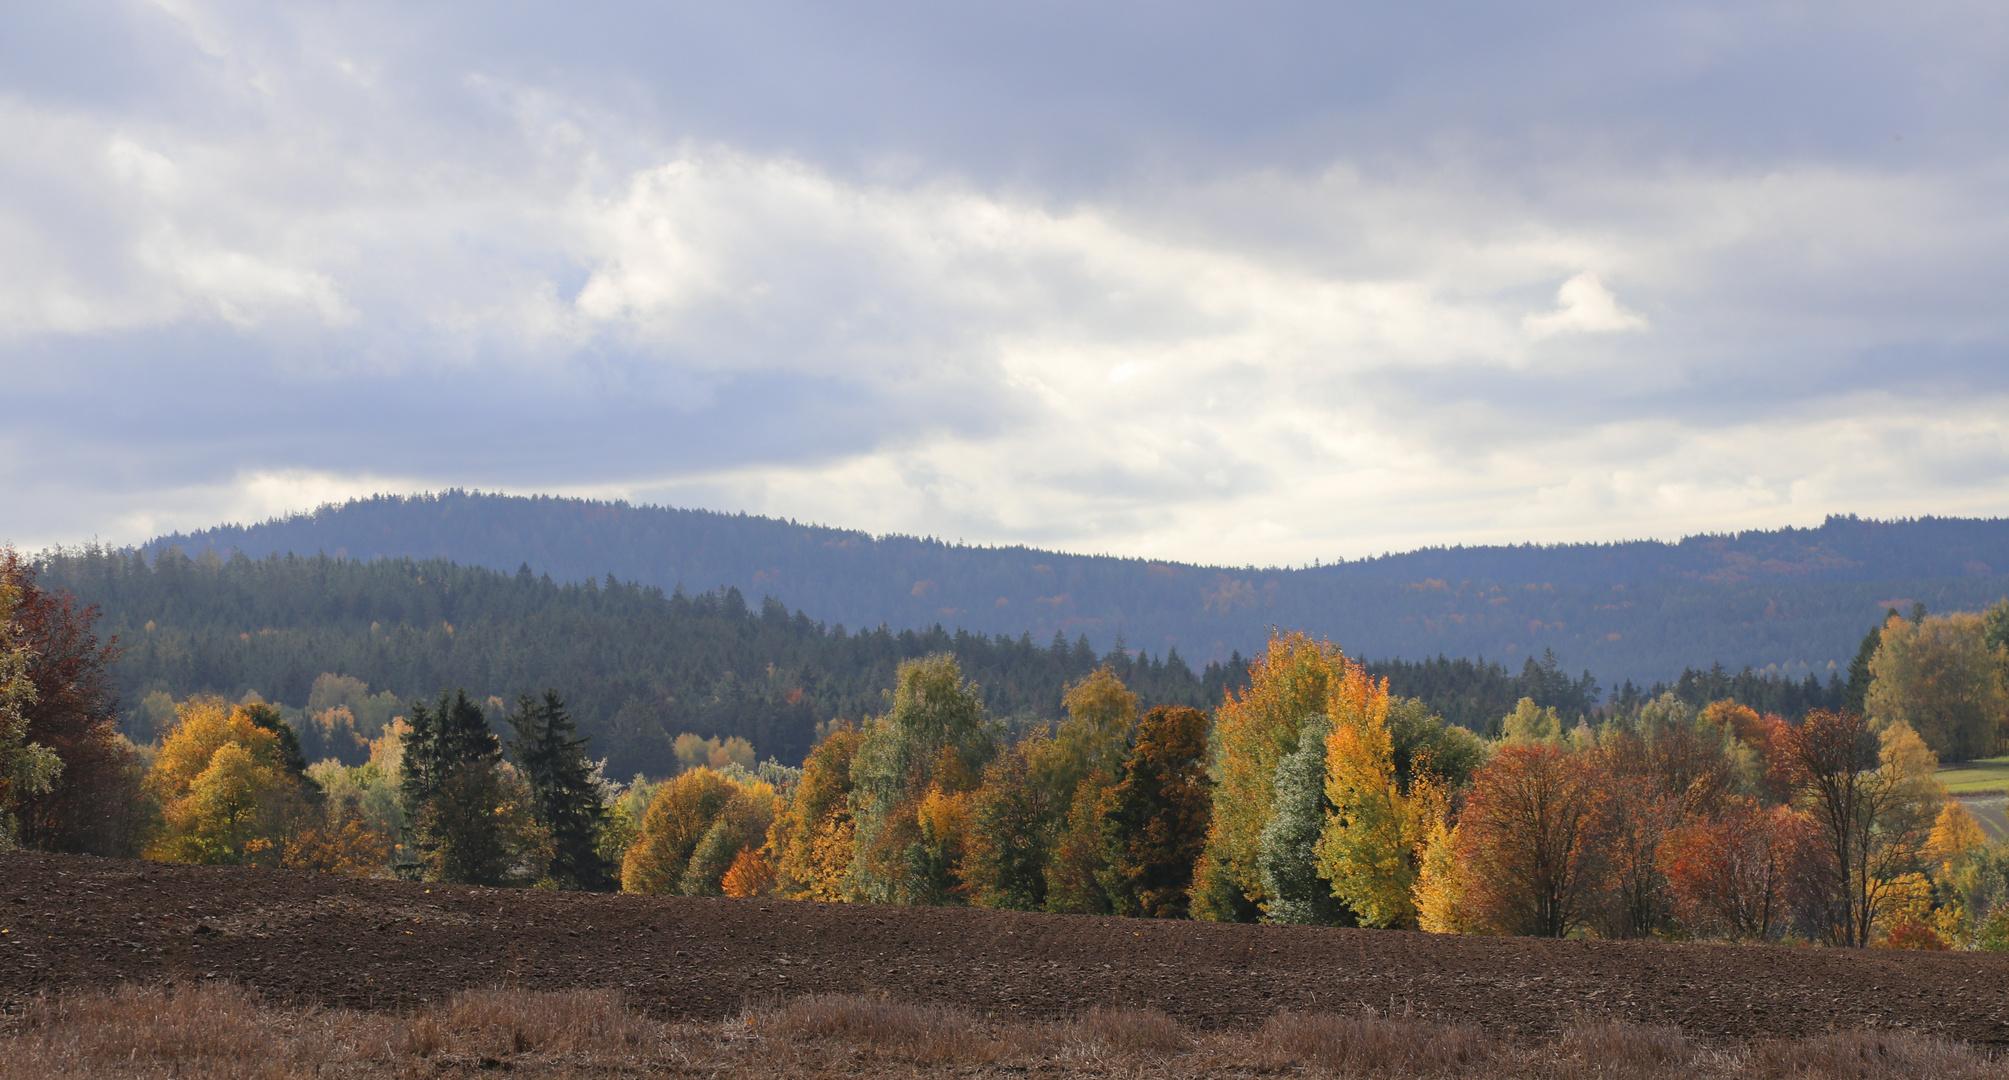 Landschaft in Herbstfarben